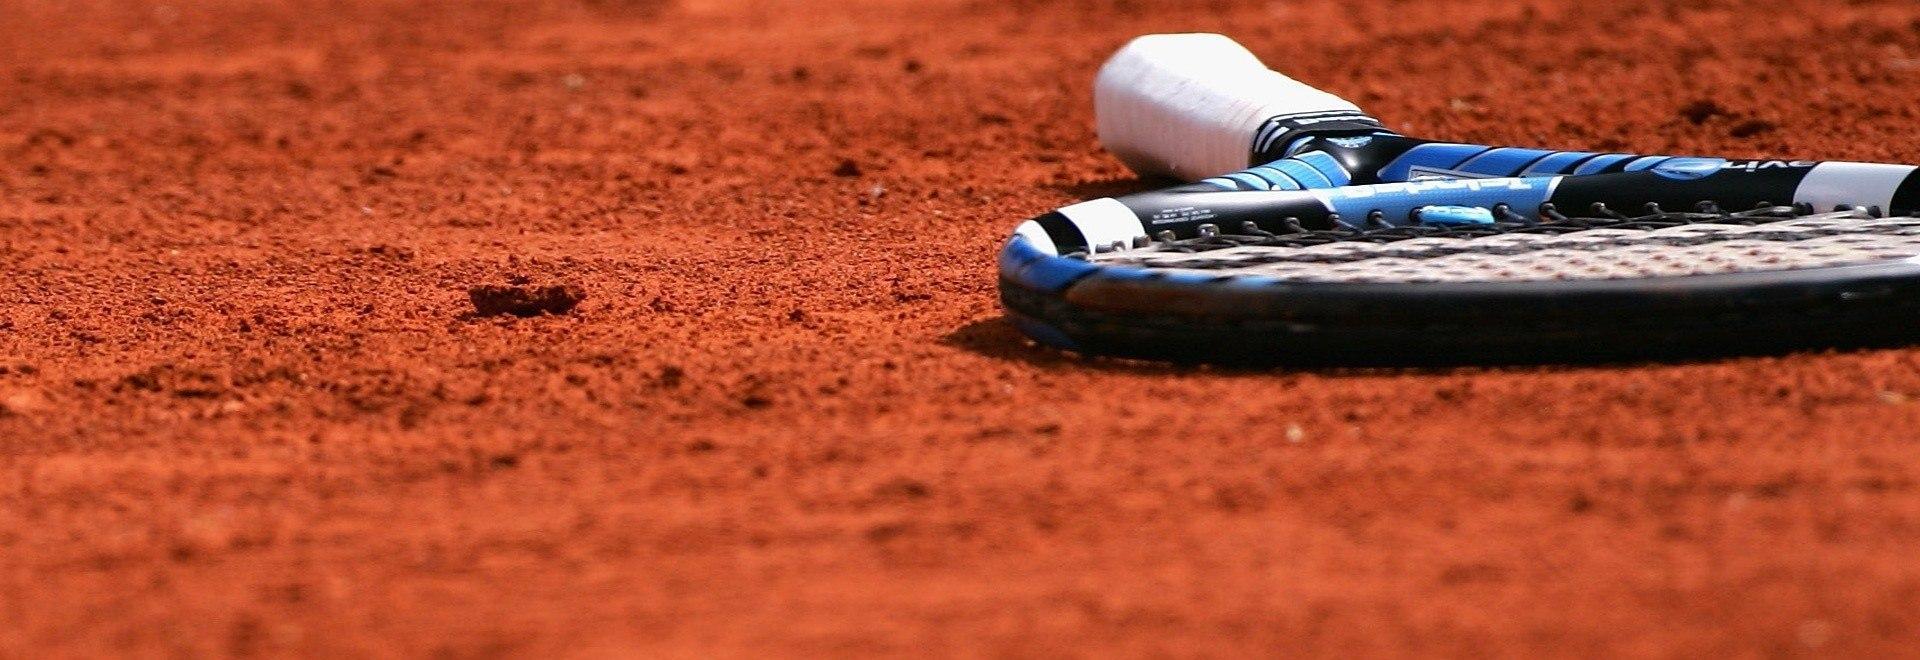 ATP World Tour Masters 1000 HL 2011